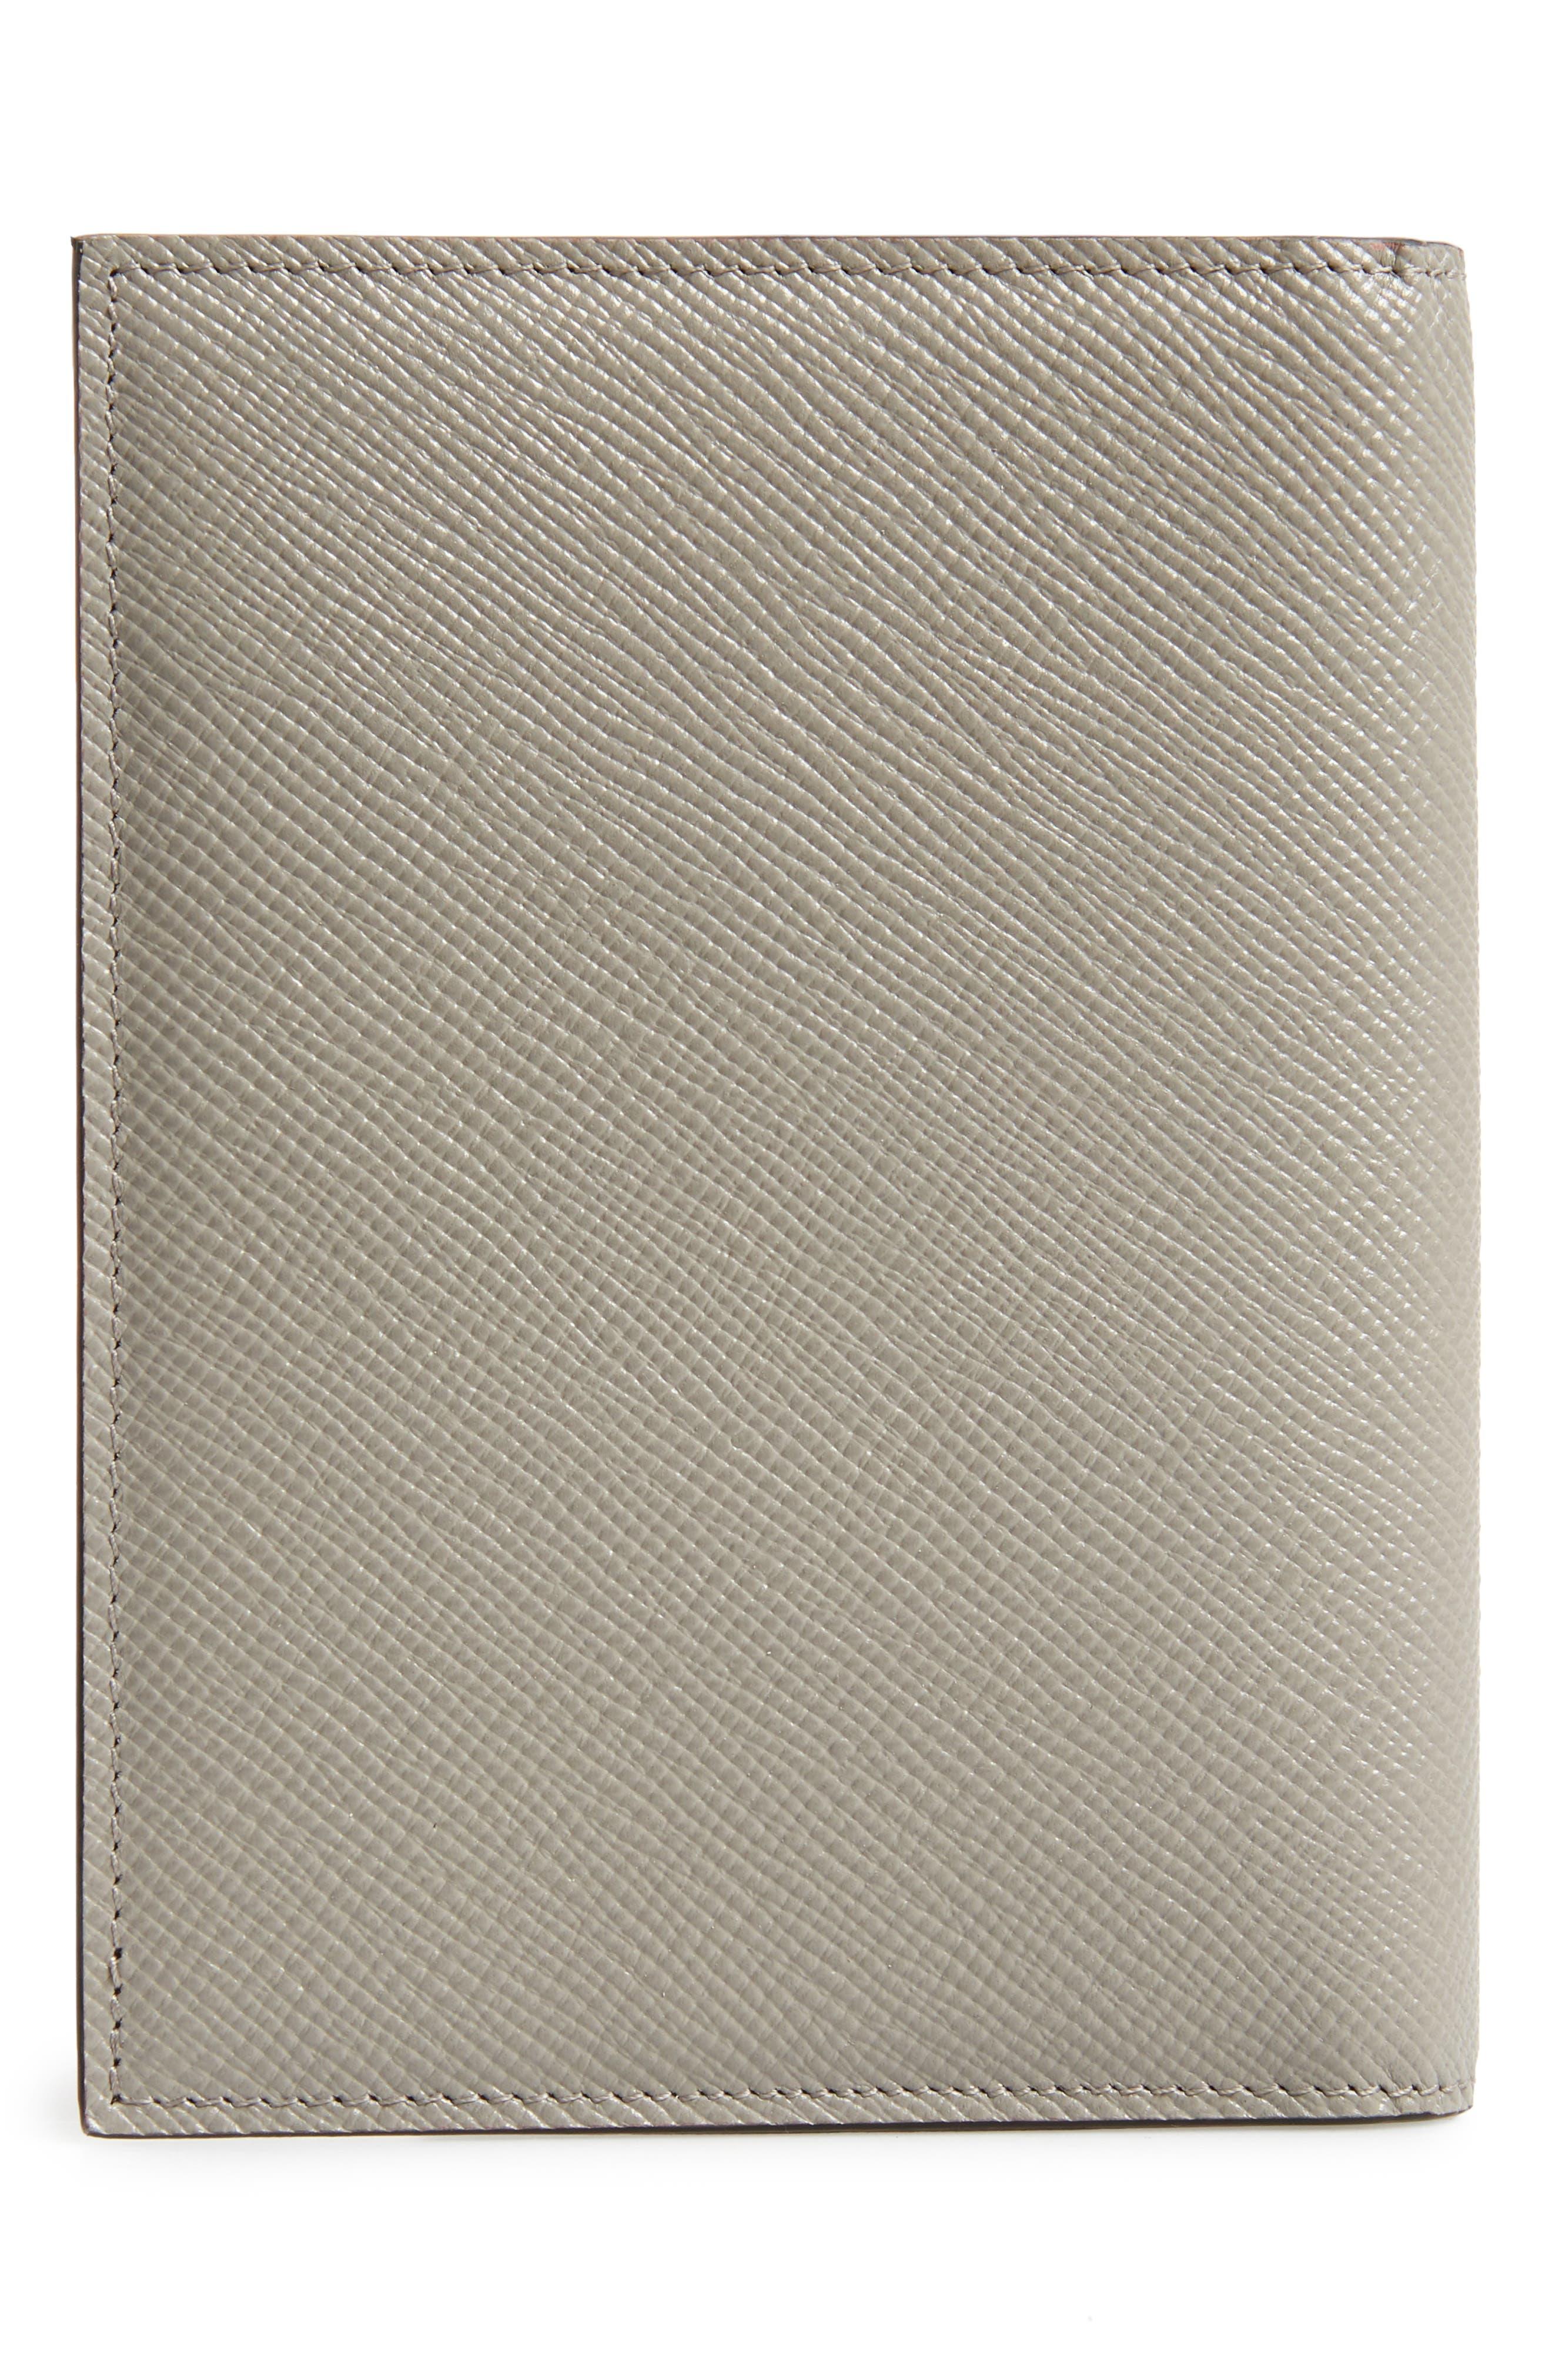 Evolution Leather Passport Case,                             Alternate thumbnail 4, color,                             020